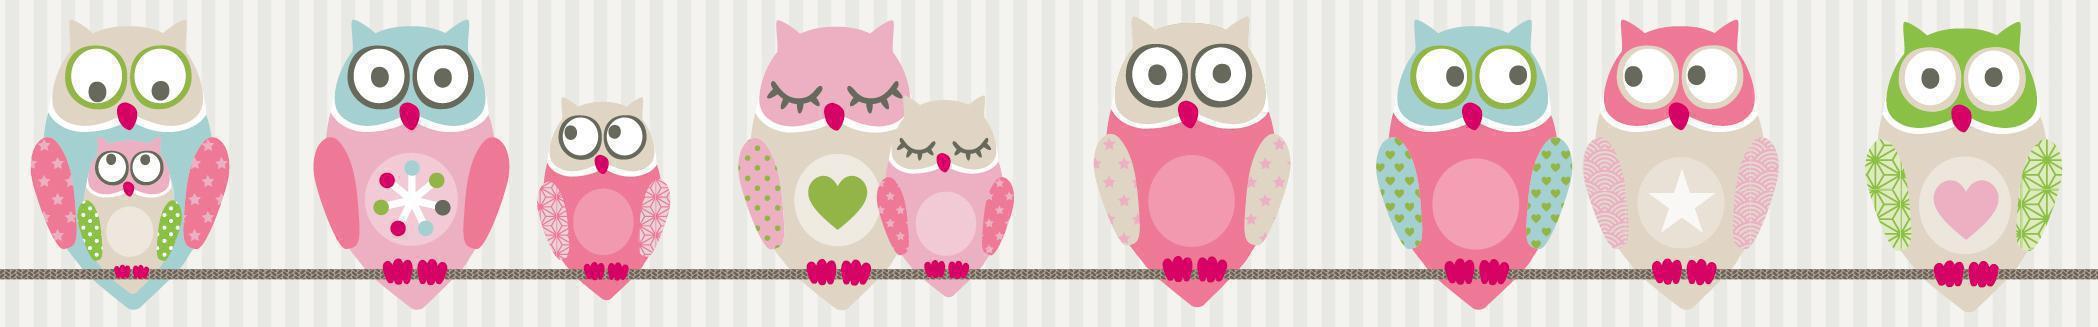 anna wand bord re eulen rosa wandsticker fensterbilder im kinderlampenland. Black Bedroom Furniture Sets. Home Design Ideas